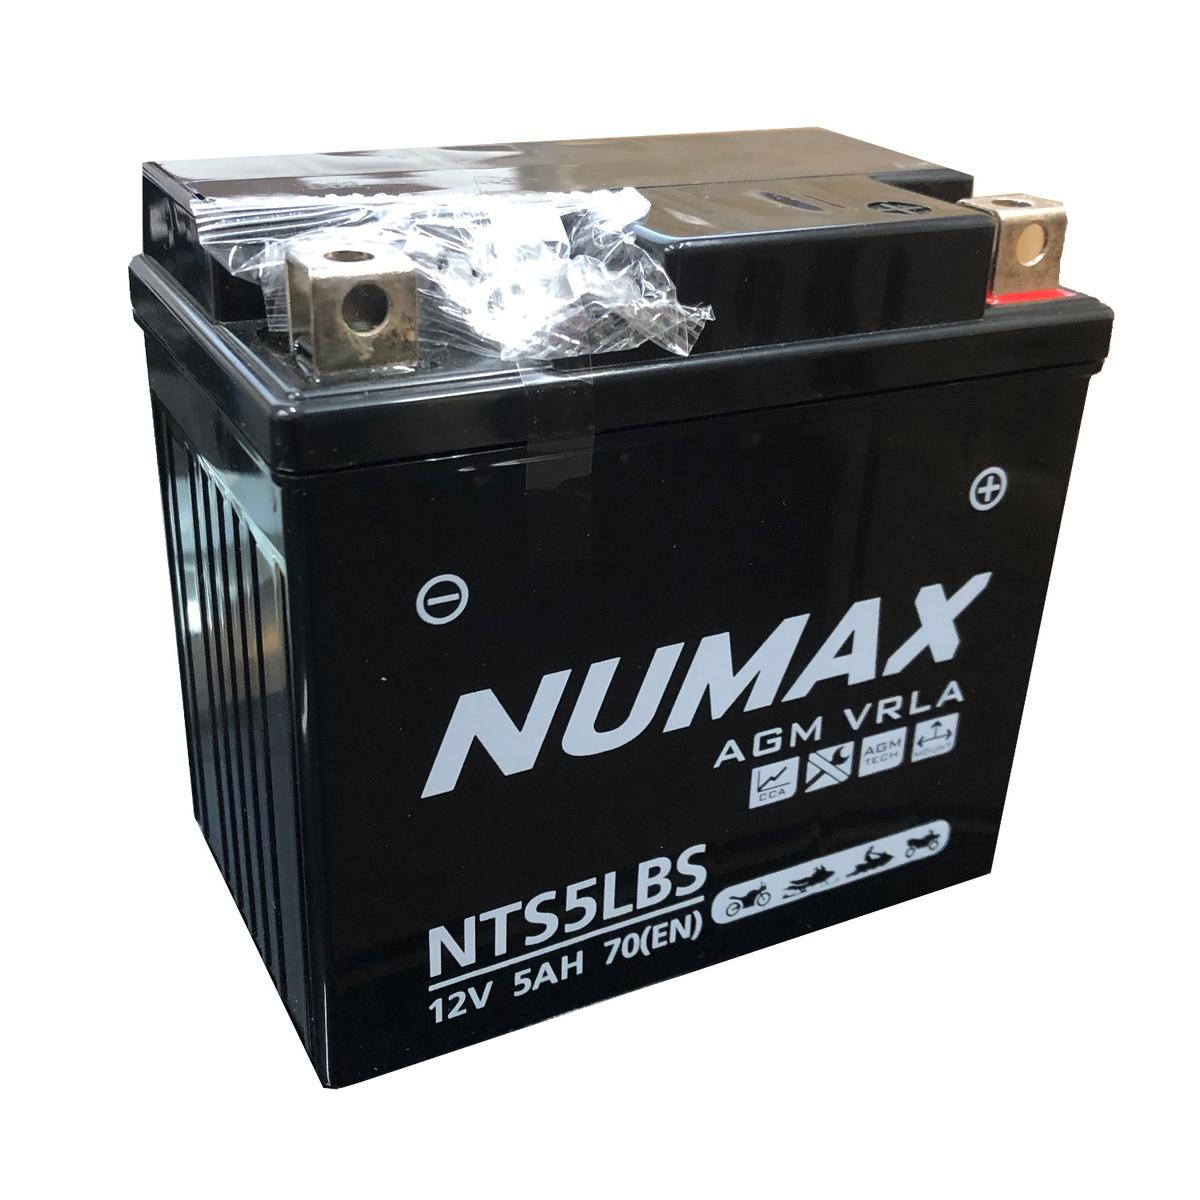 Numax 12v NTS5LBS Motorbike Bike Battery YAMAHA 450cc WR450F YTX5L-4